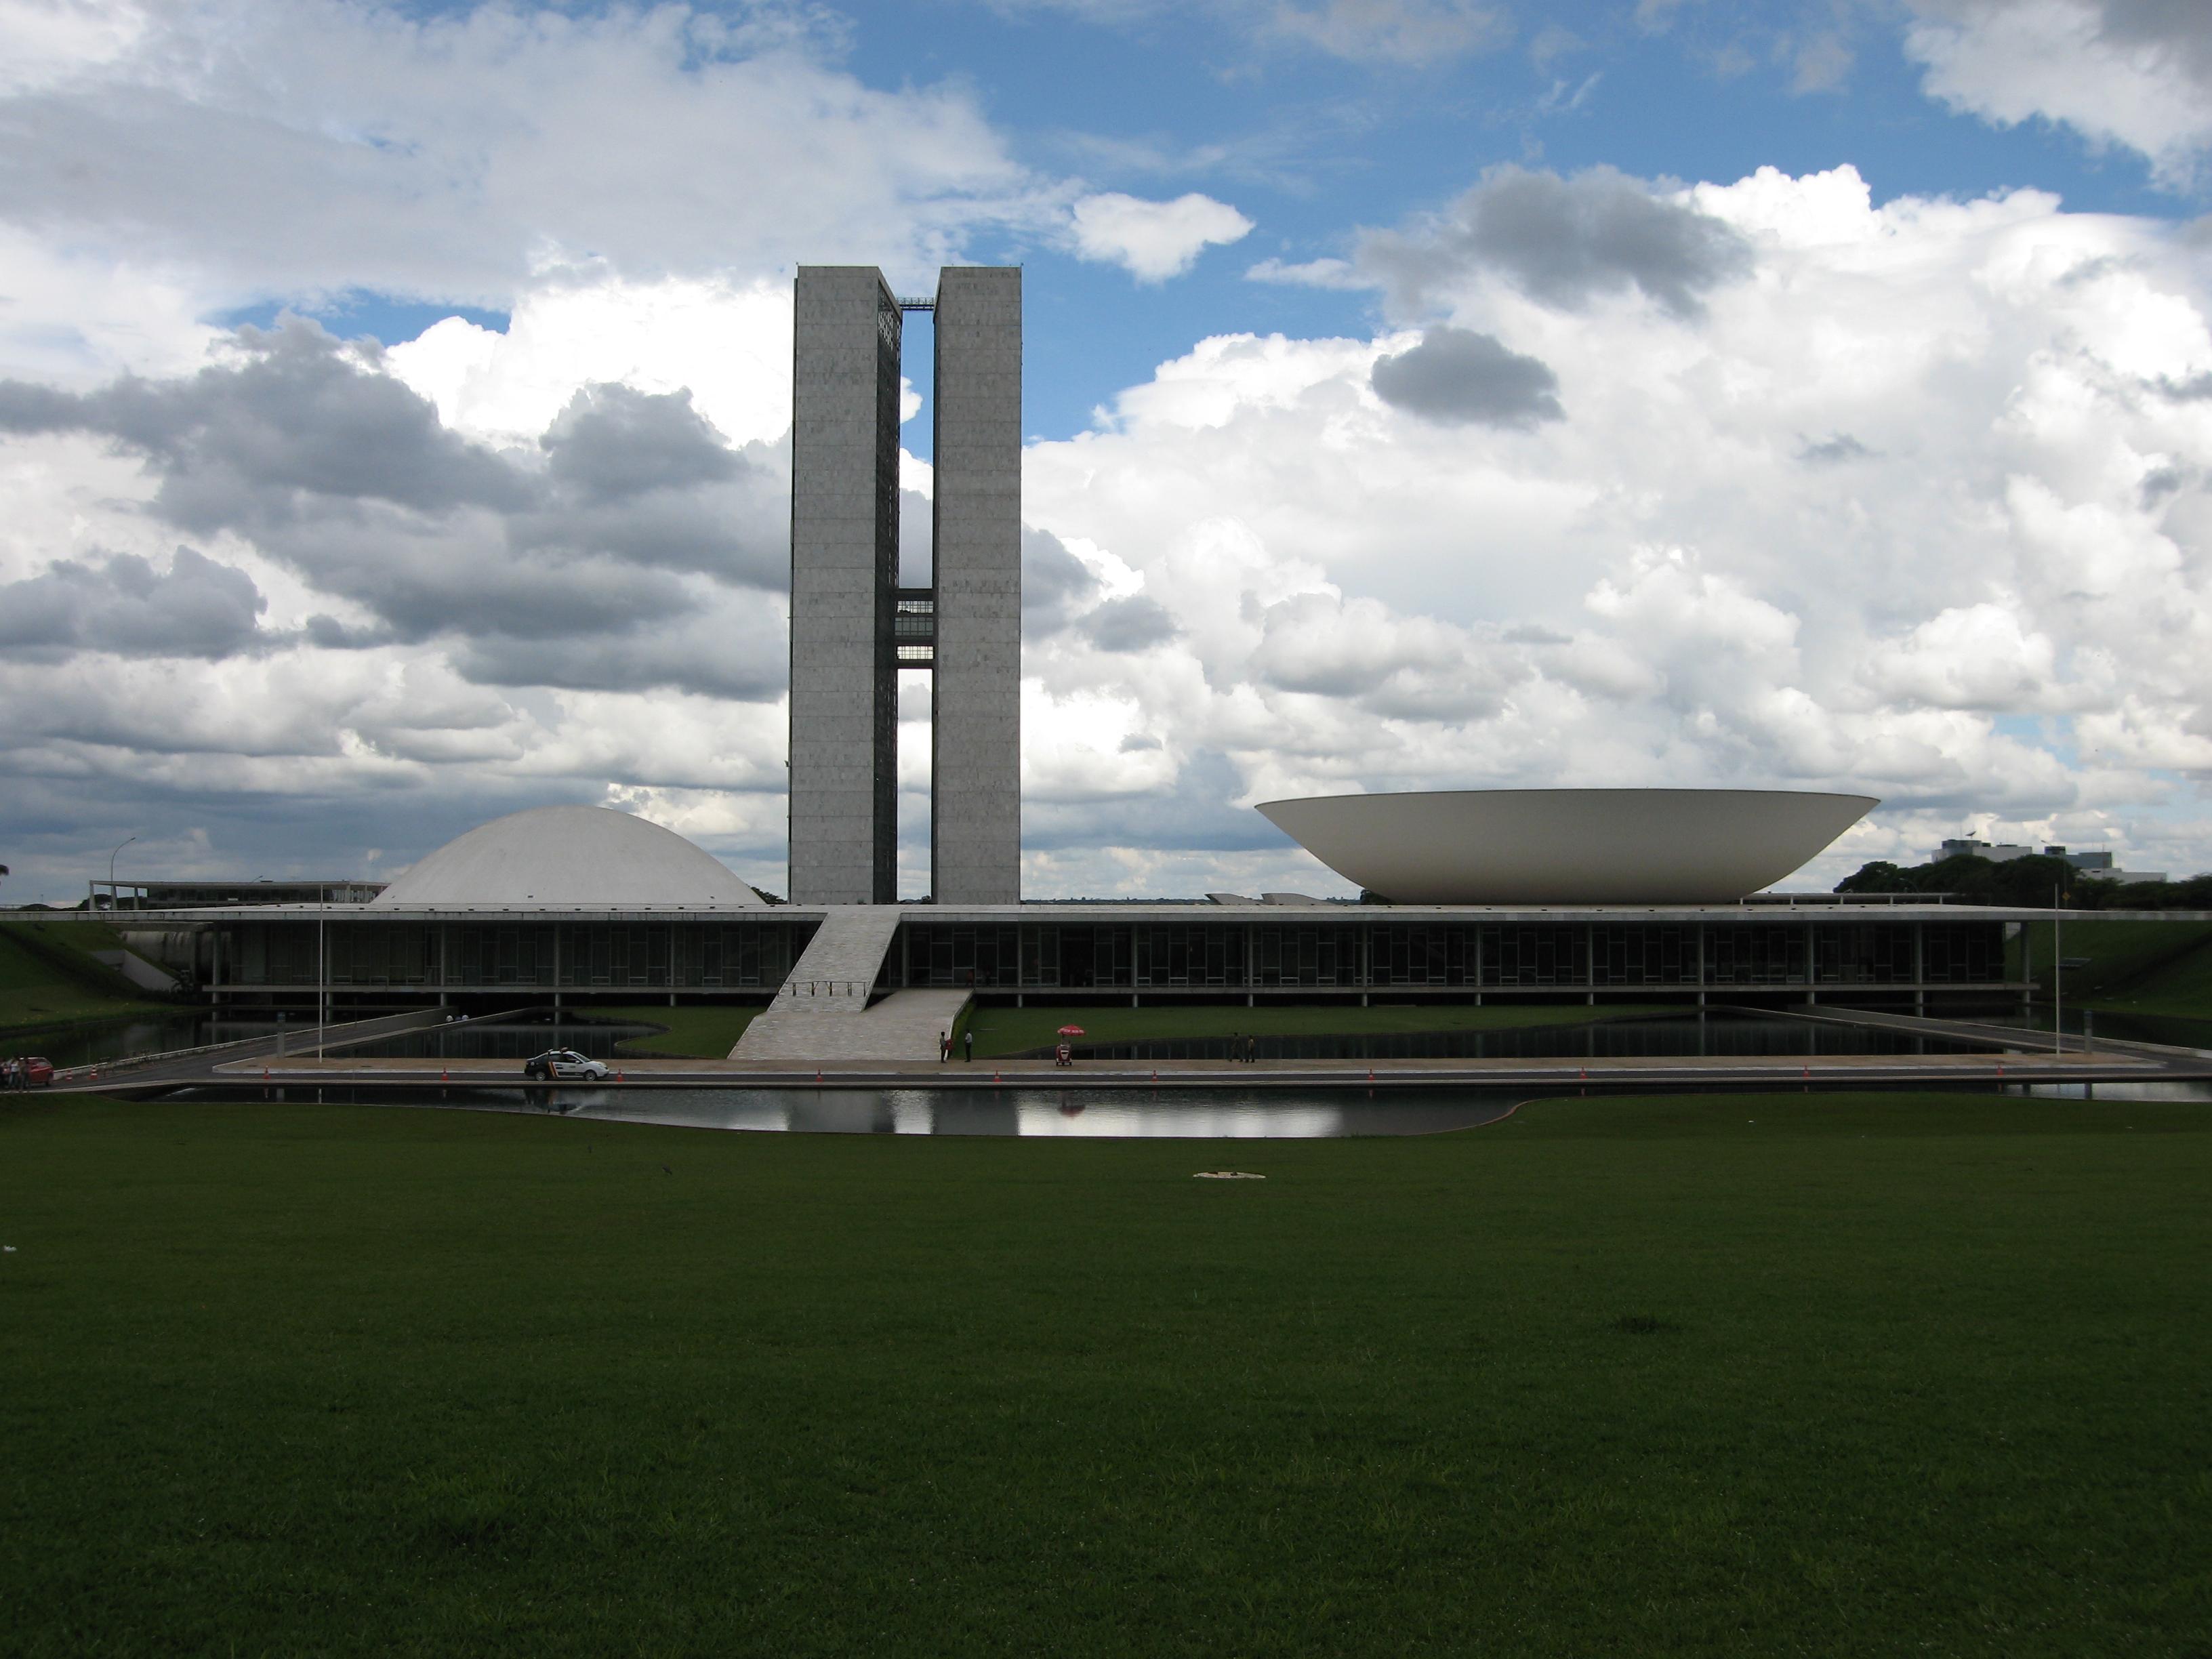 Brasilia_11_1095